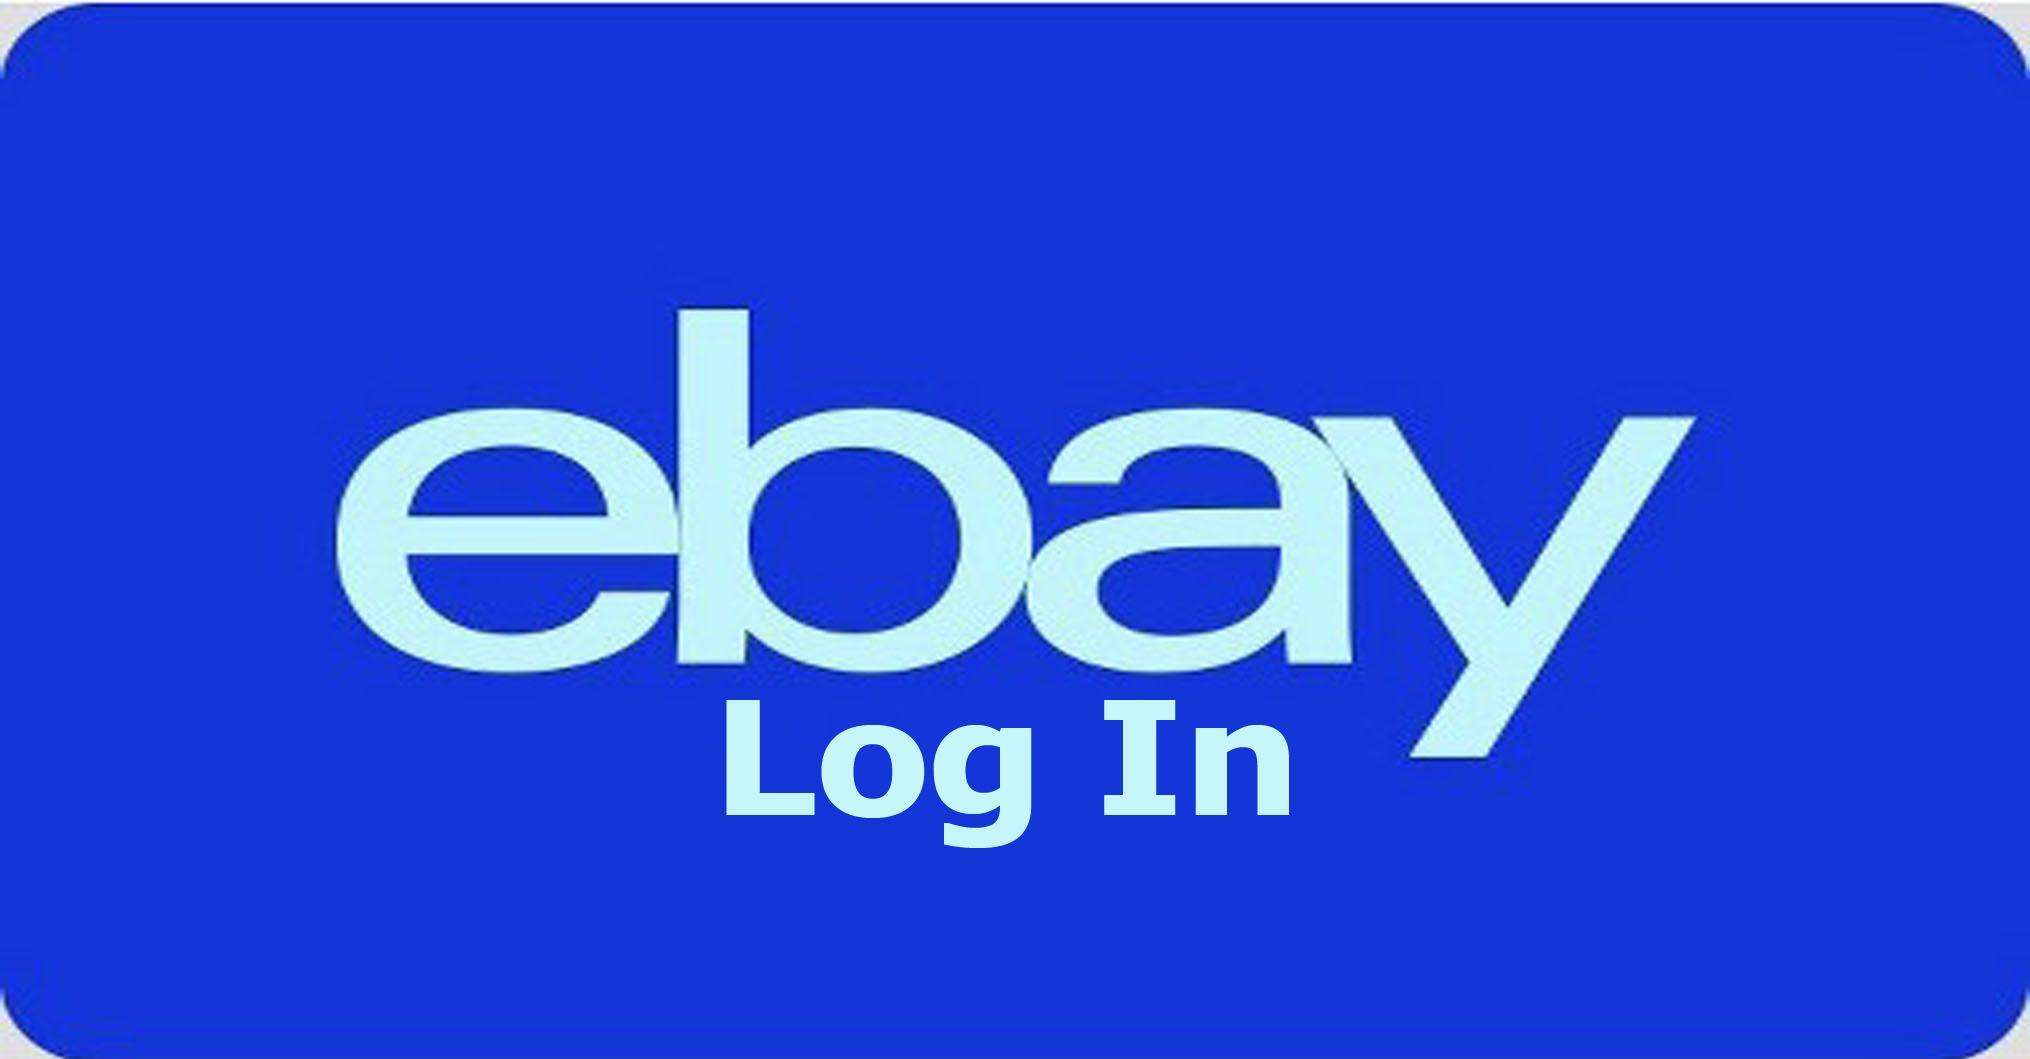 Ebay Log In How Do I Log In To My Ebay Account Instant Messenger Ebay My Ebay